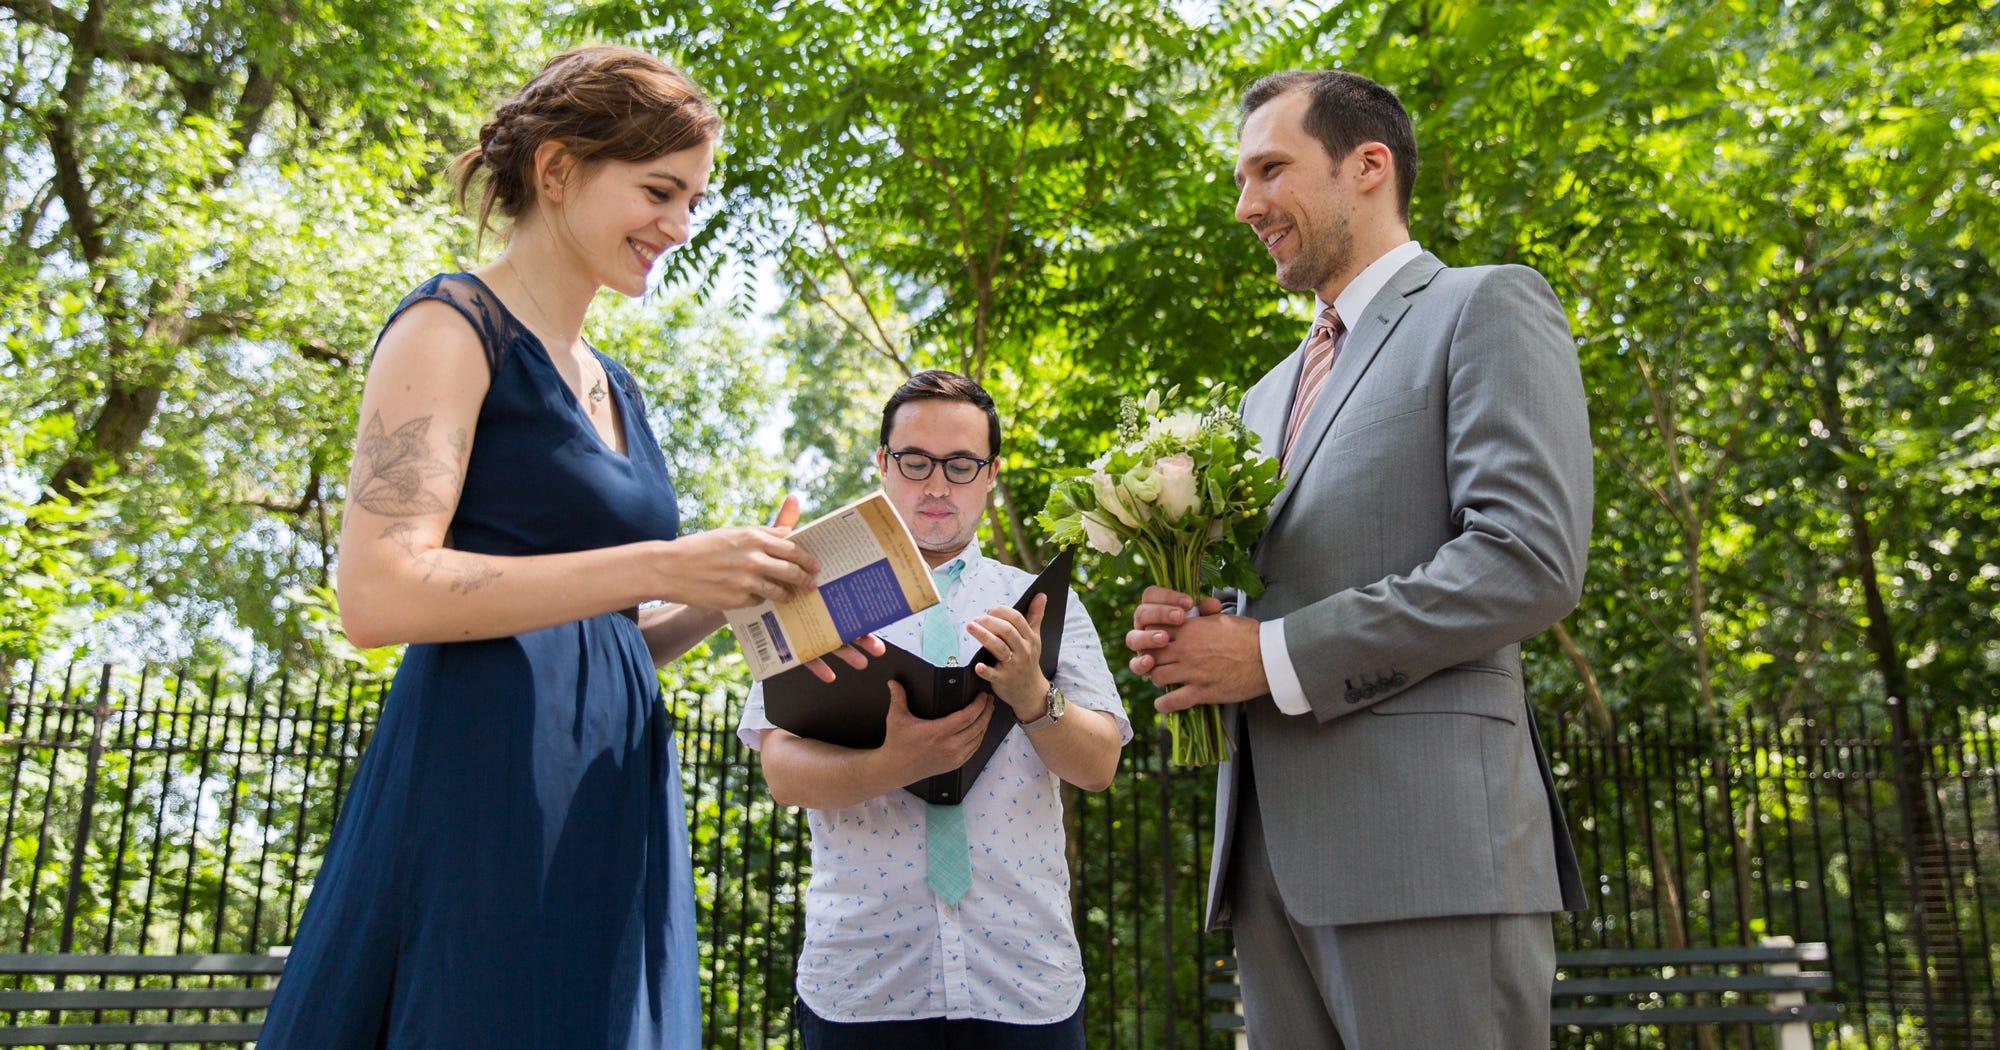 60 Non Traditional Wedding Vows: Traditional Wedding Vows